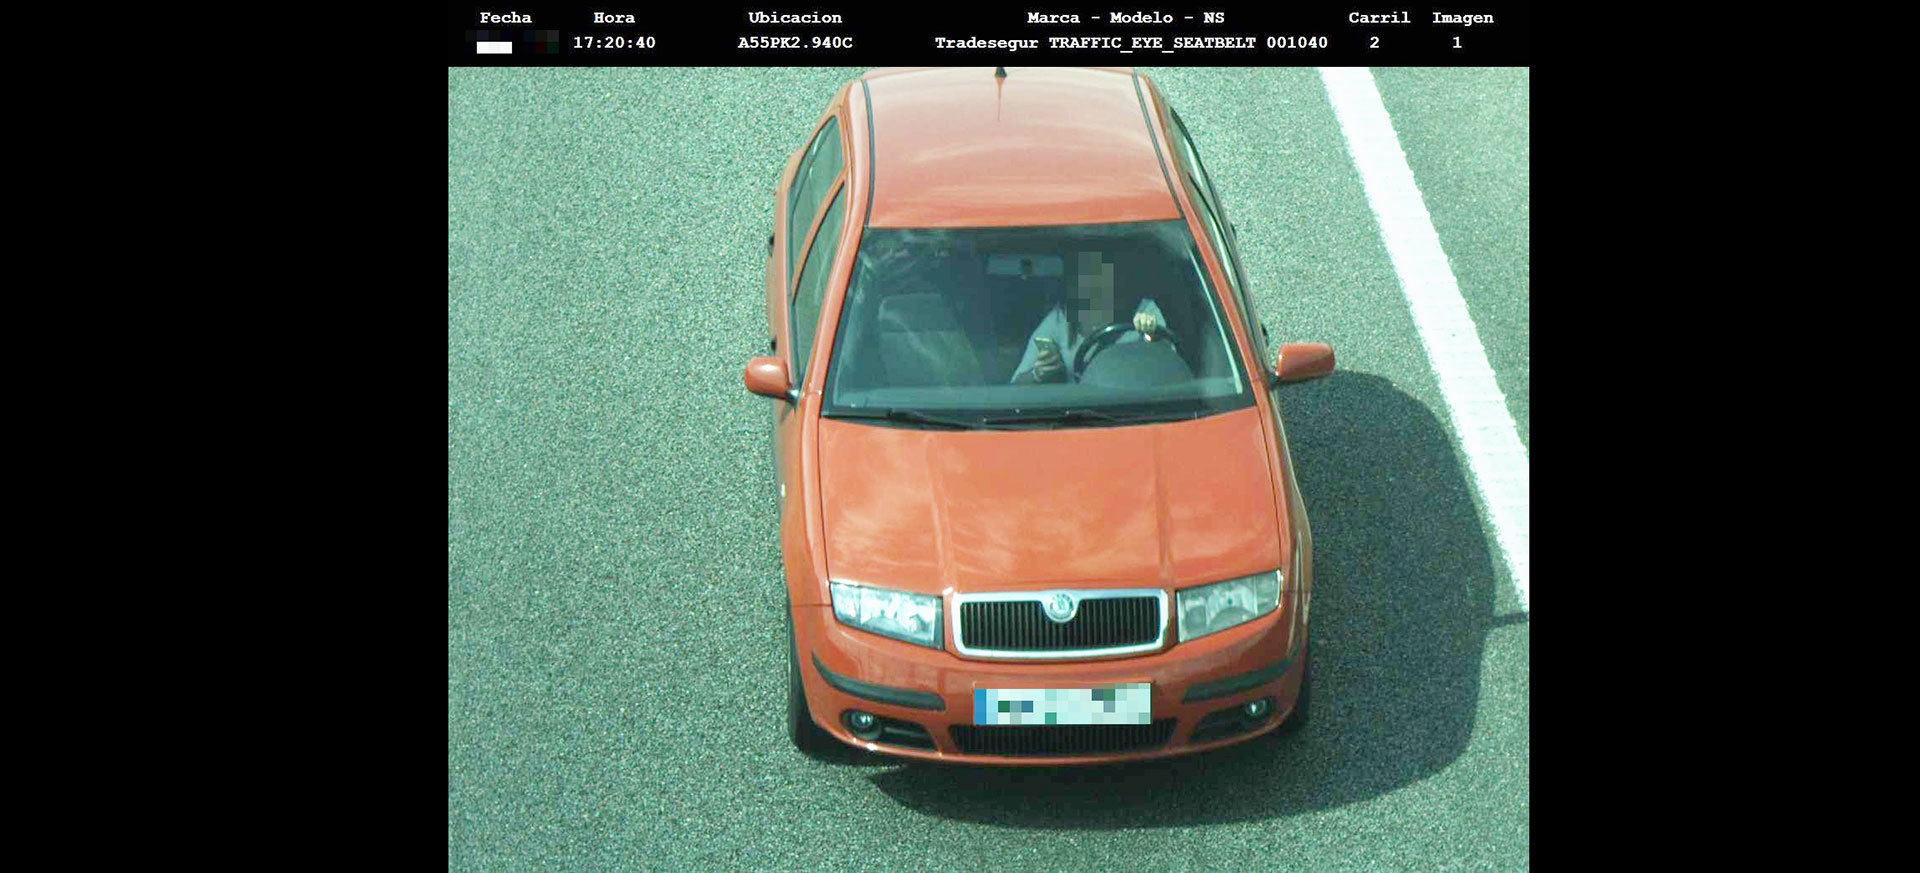 Radar Telefono Movil Foto